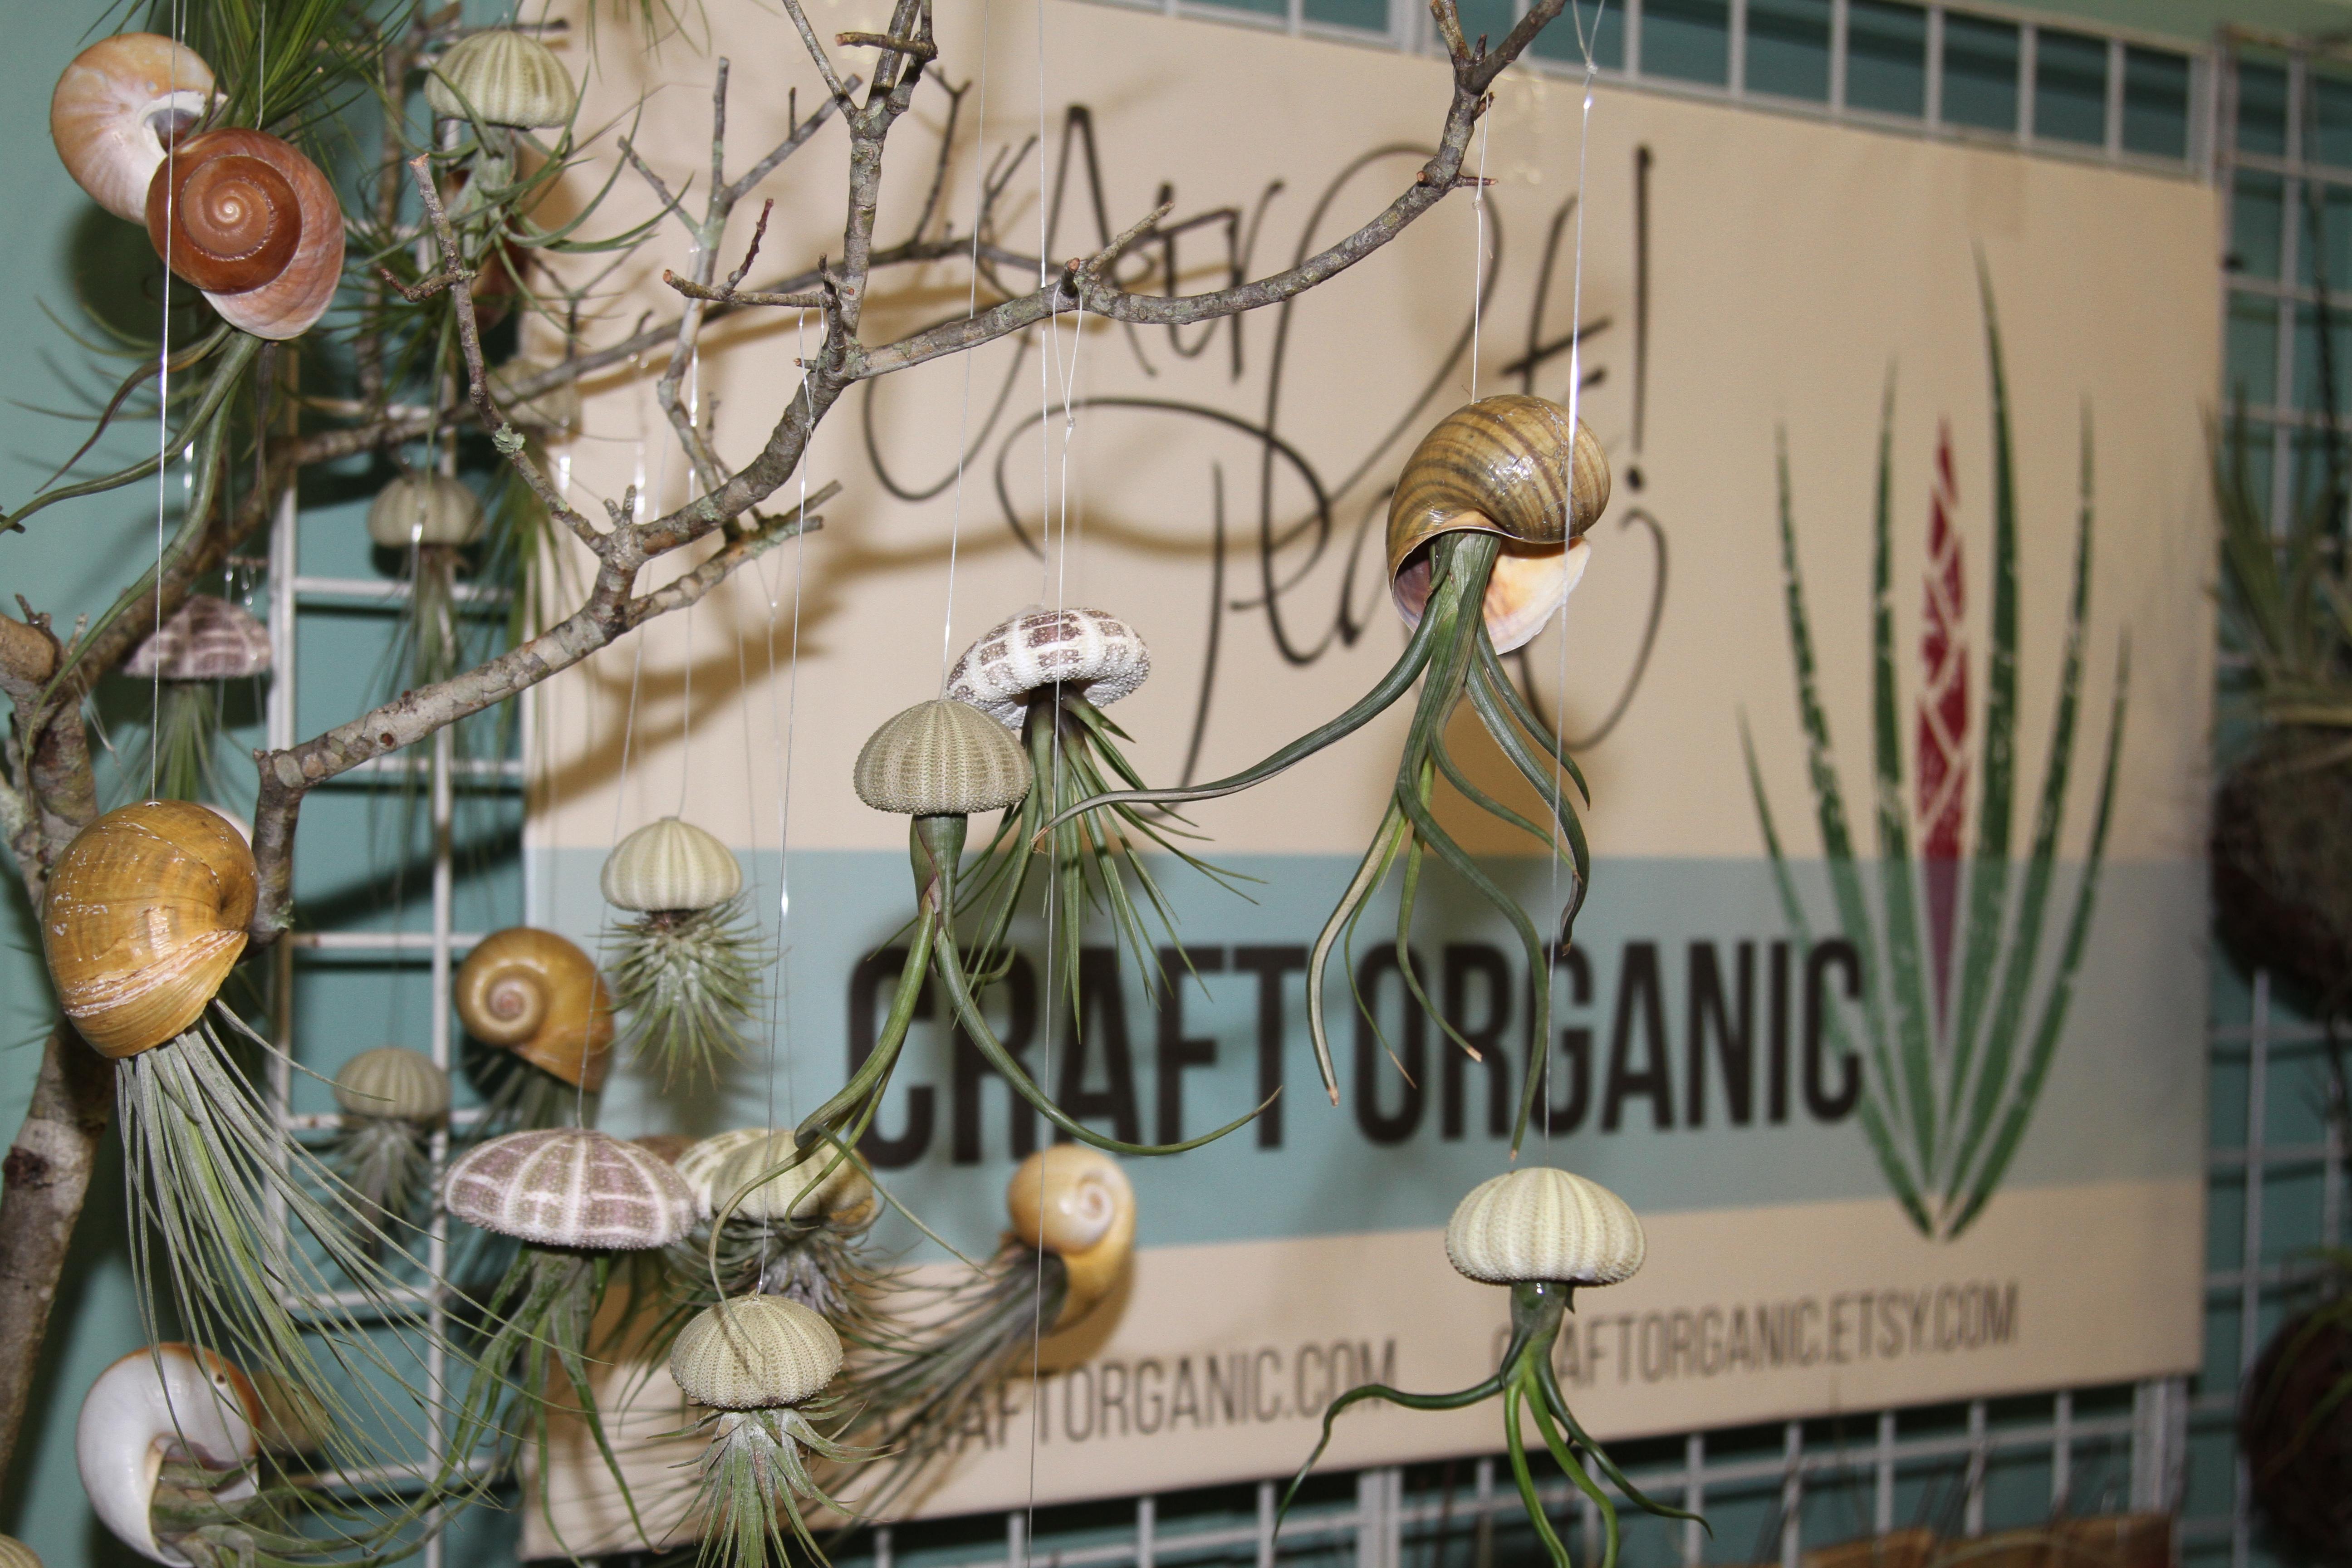 Atomic Holiday Bazaar celebrates 13th season